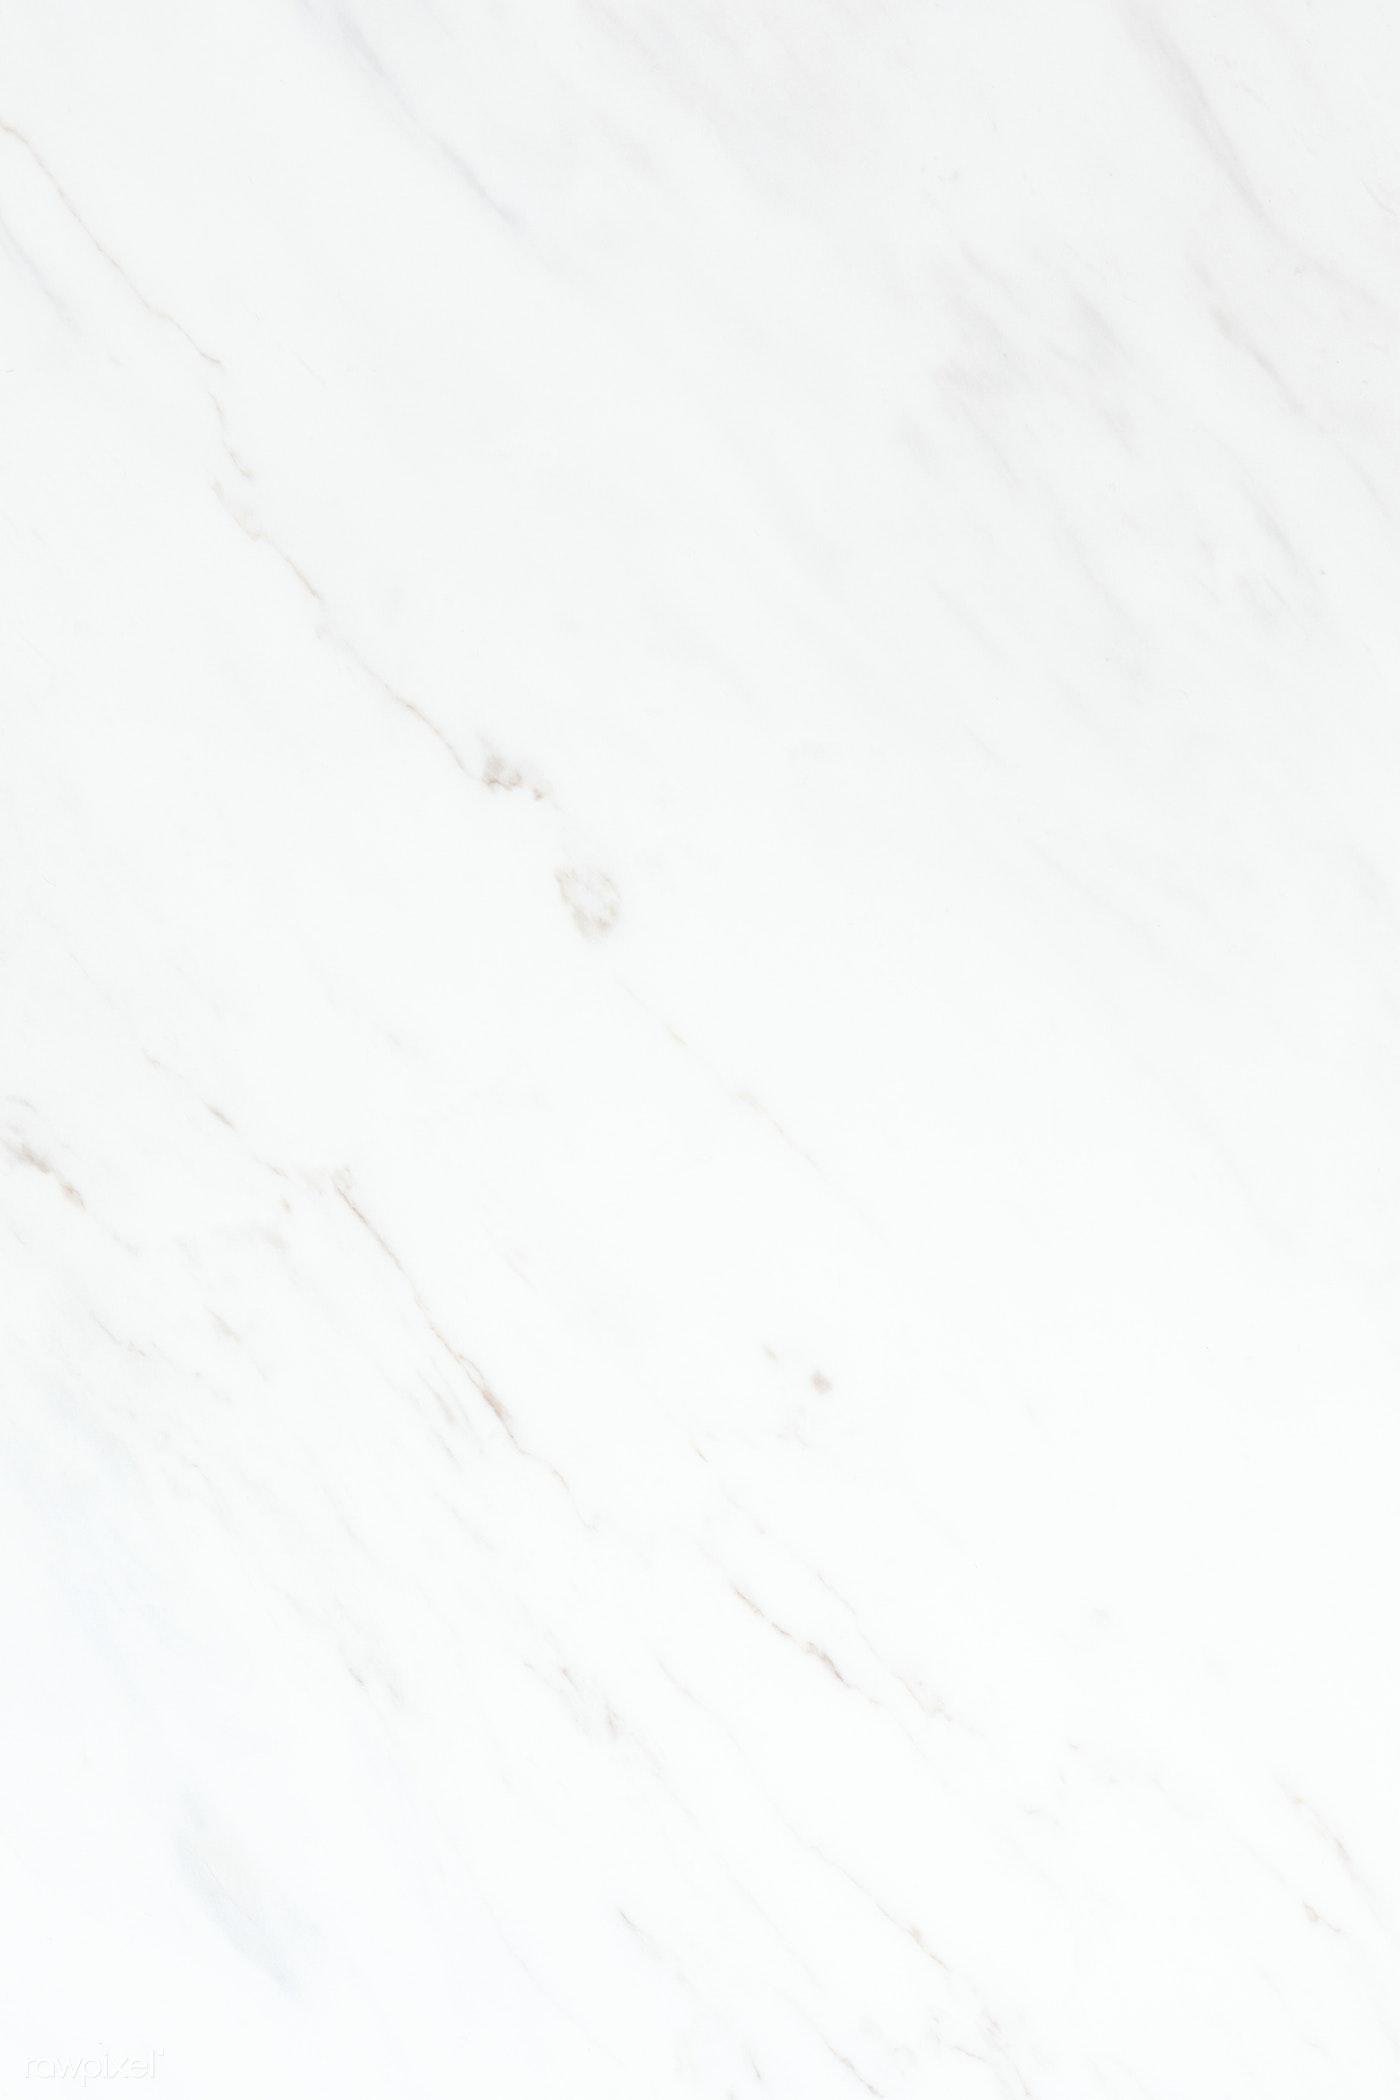 White Marble Slate Royalty Free Stock Photo 2035786